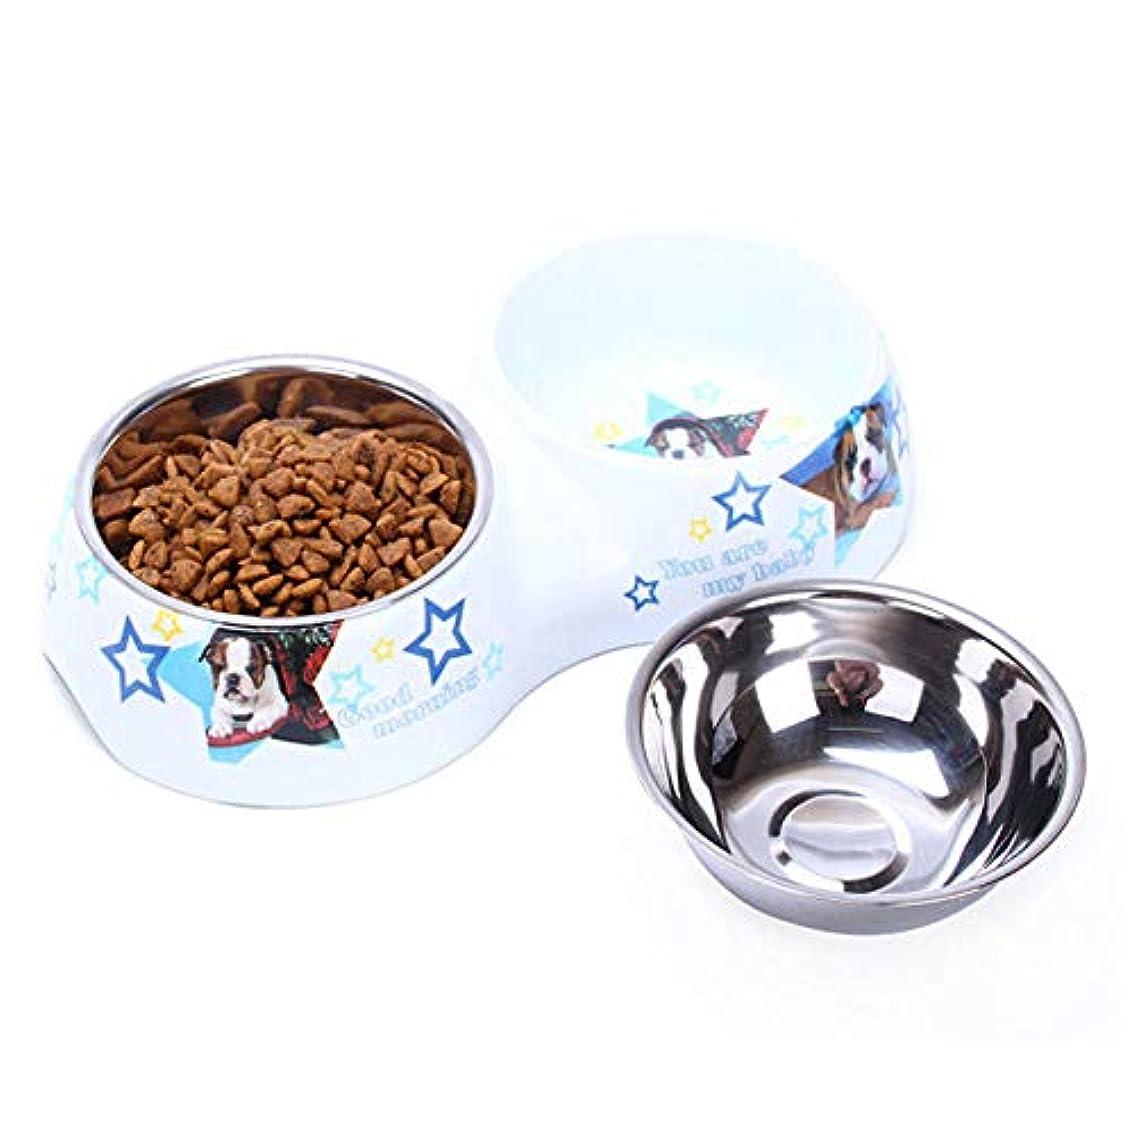 Xian ペットボウル、犬と猫の滑り止めサイズの給餌ダブルボウル、中小の犬と猫が食べたり飲んだりするのに適しています Easy to Clean Non-Skid Bowls for Dogs